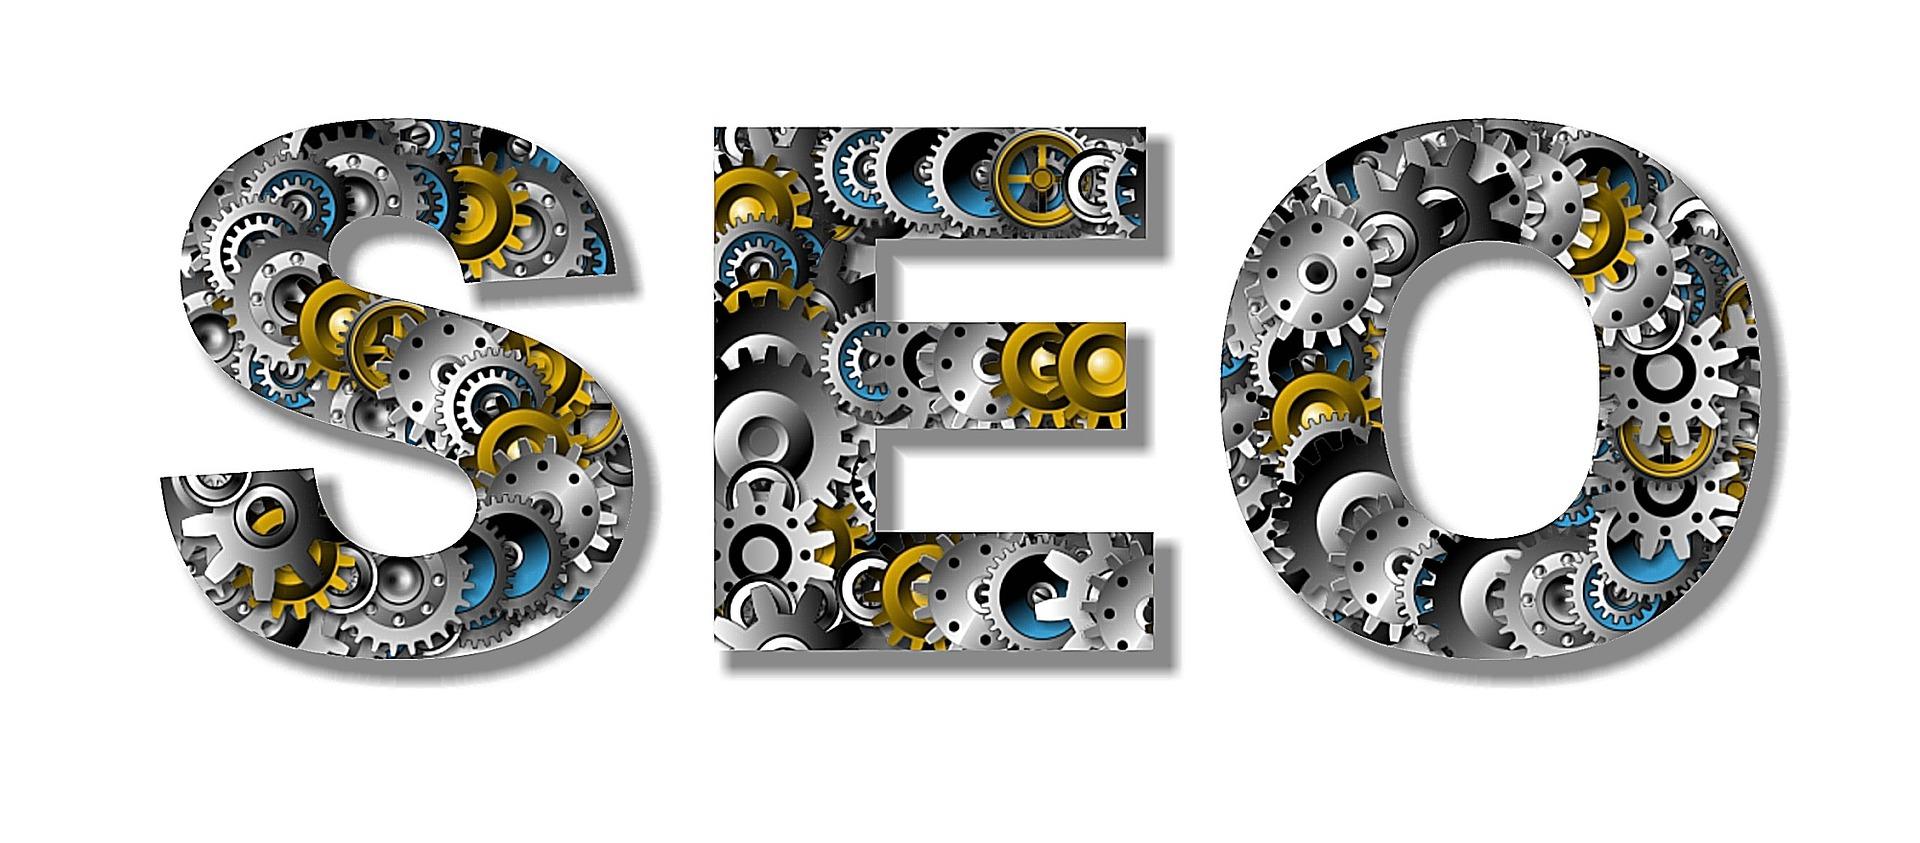 How SEO Can Help Your Local Business? SEO basics